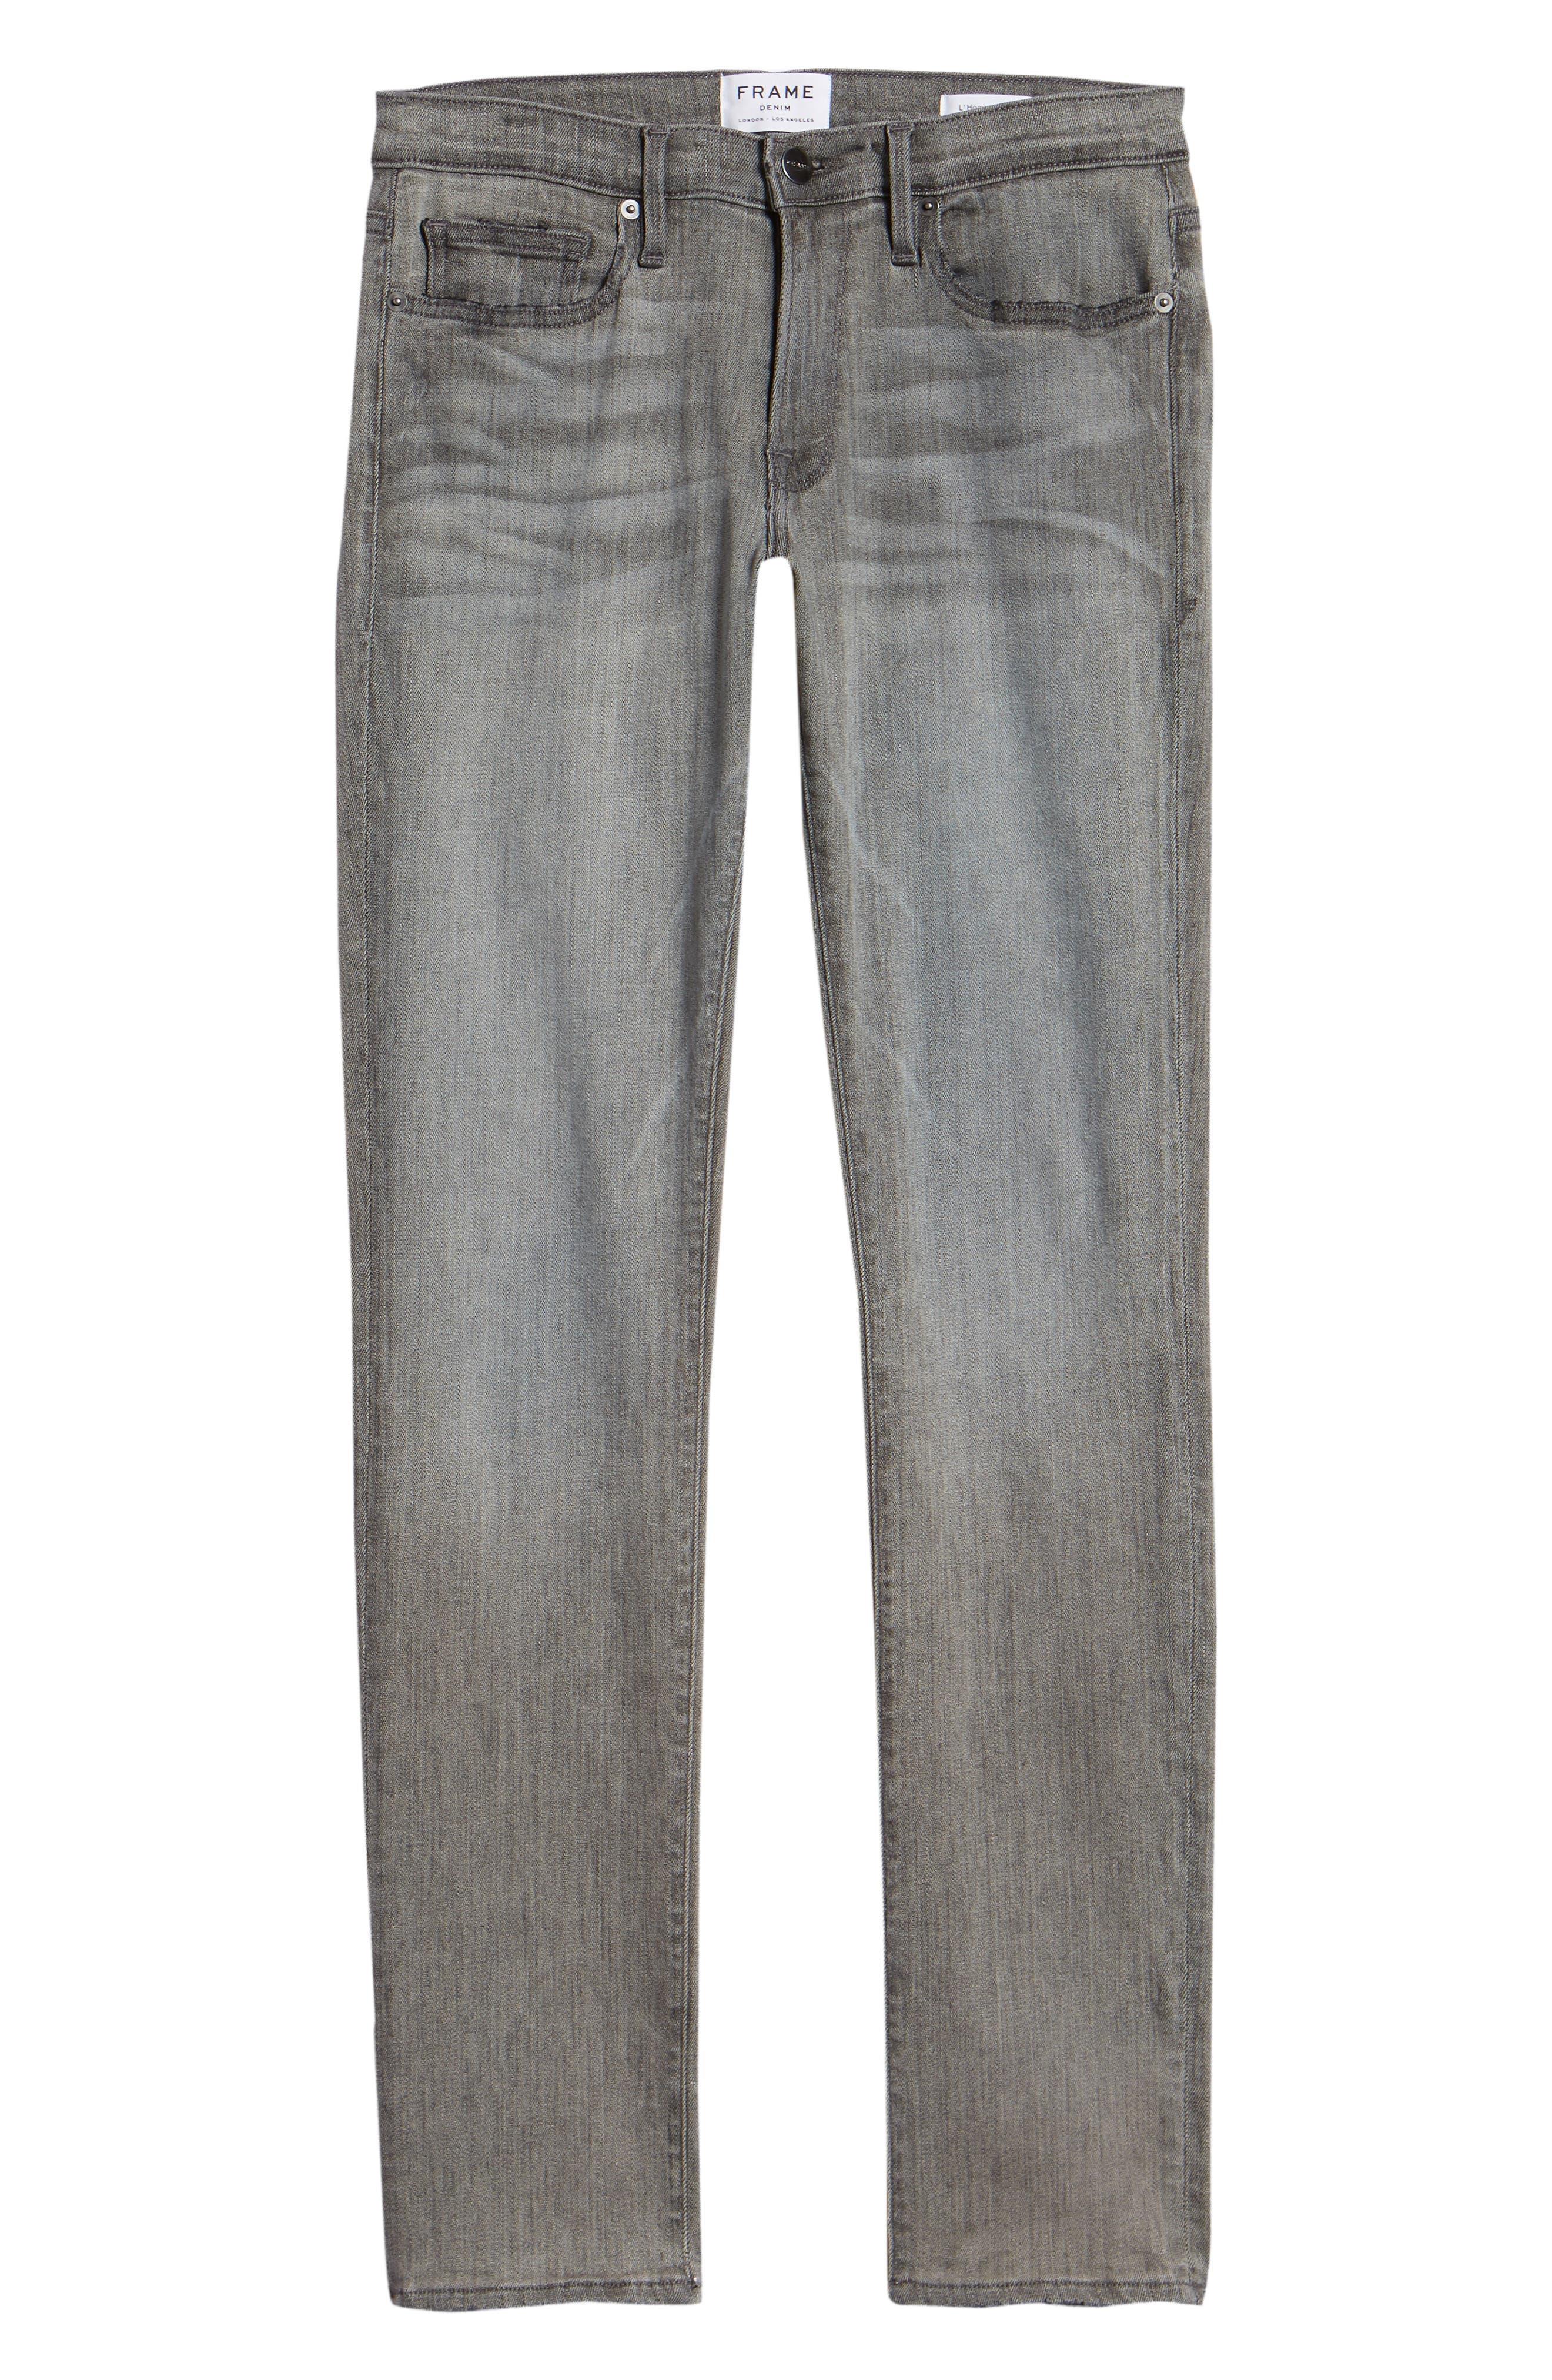 L'Homme Skinny Skinny Fit Jeans,                             Alternate thumbnail 6, color,                             FORT MCHEN